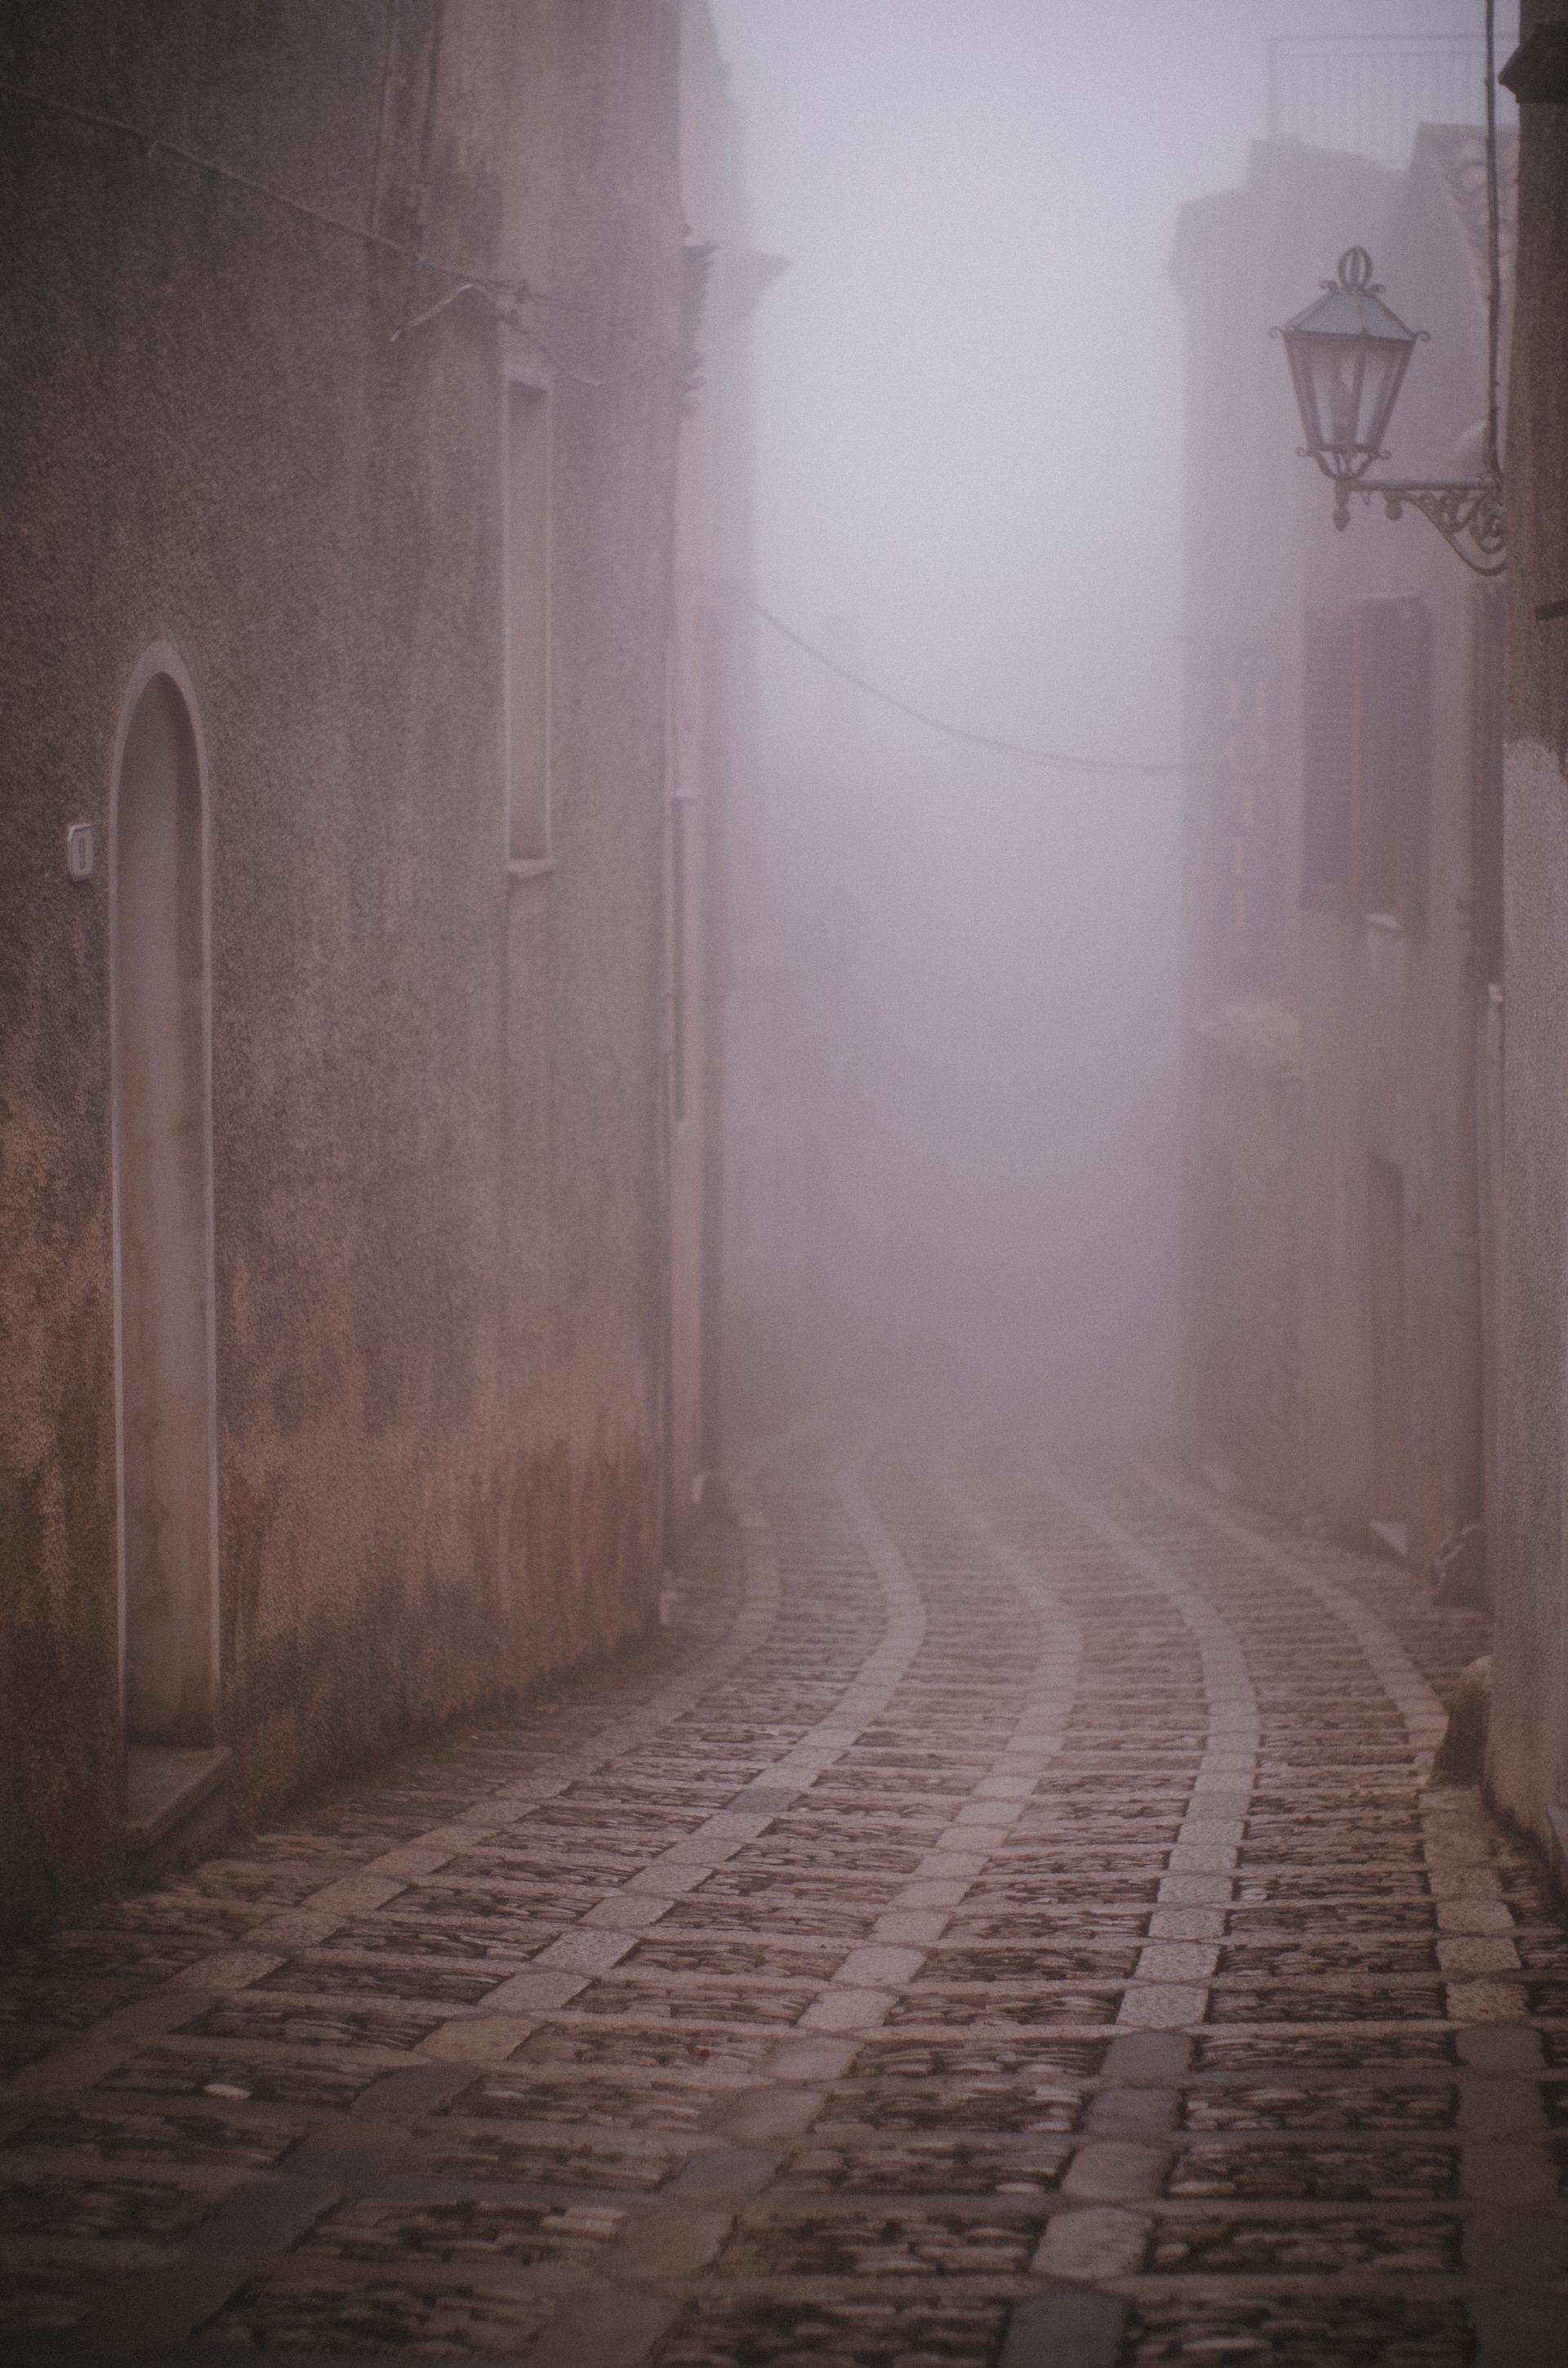 SICILY - Erice